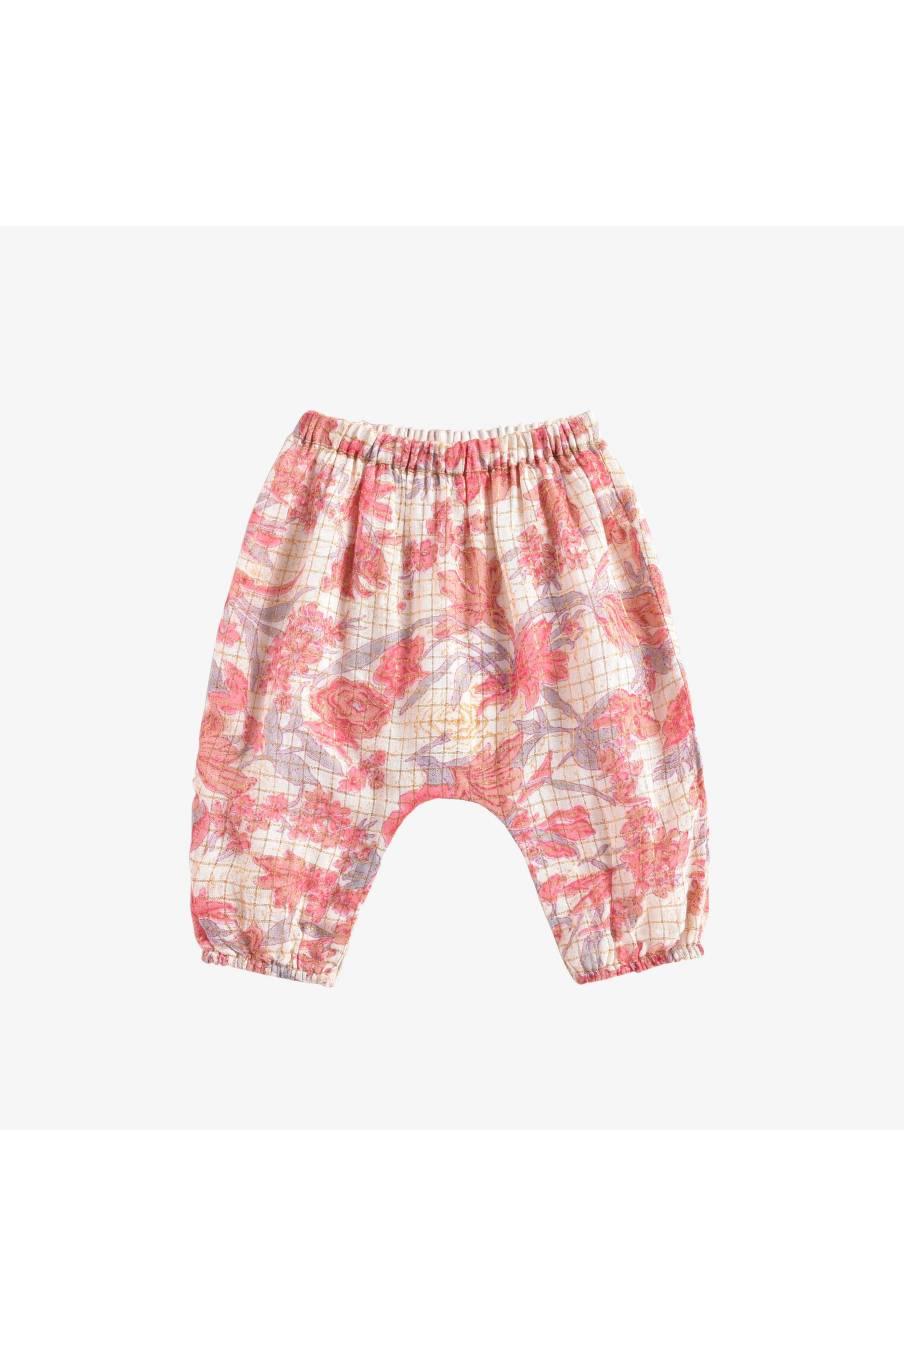 Pants Flor Pink Flowers